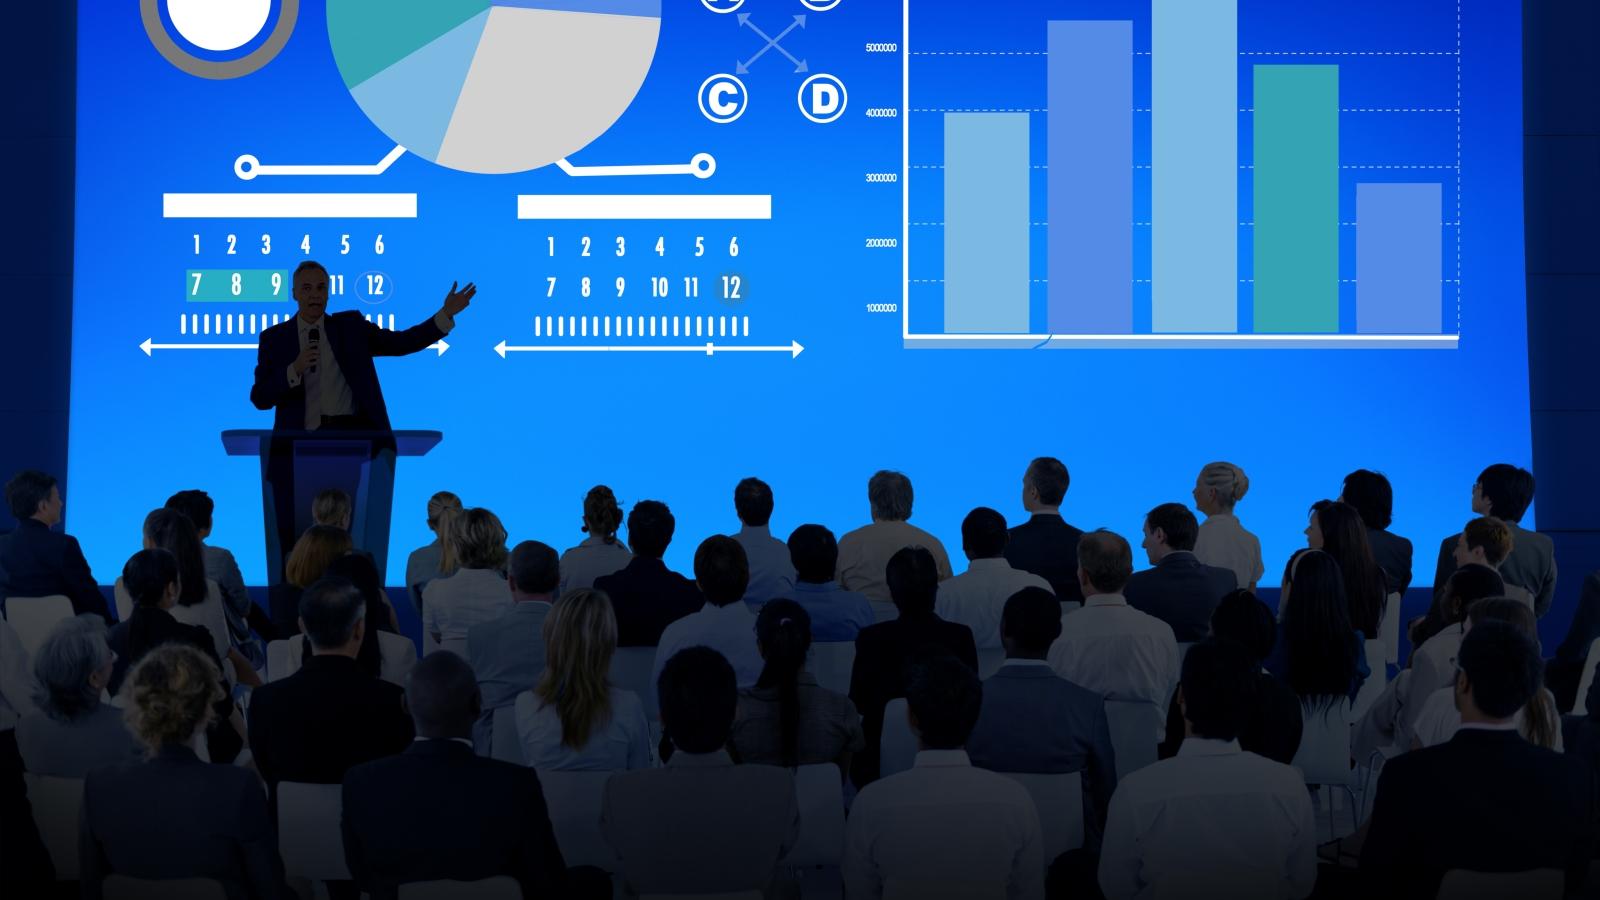 Presenting presentations